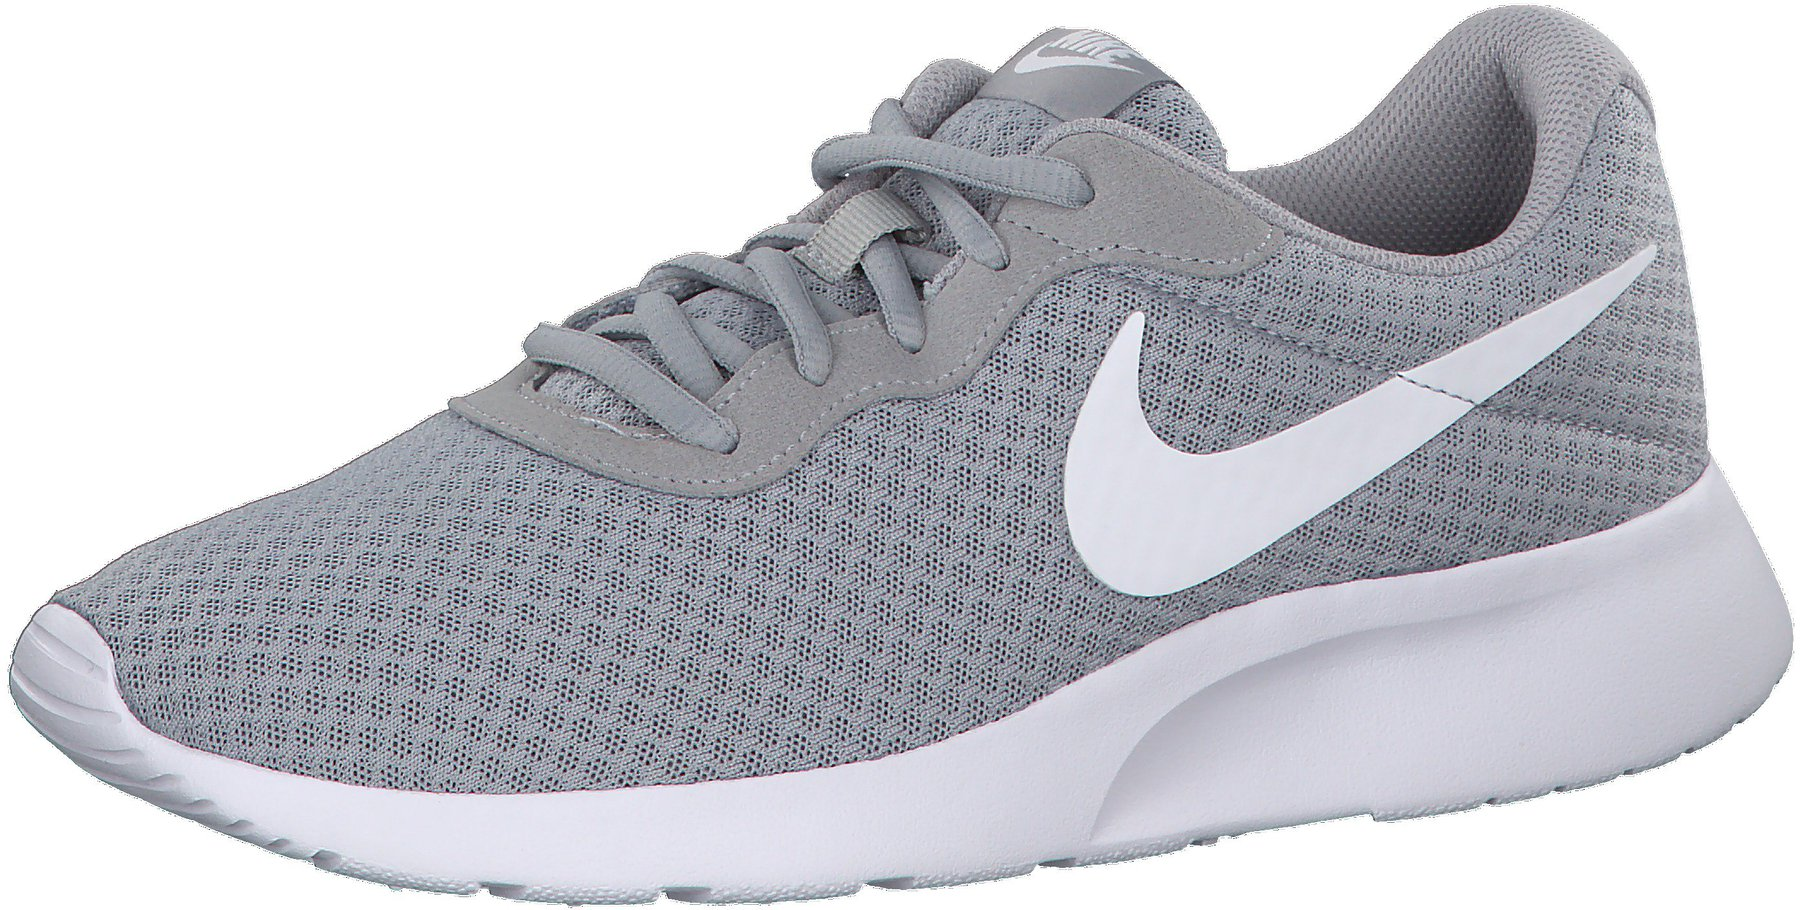 coupon nike tanjun grau sandals uk 9c0bd 745a2